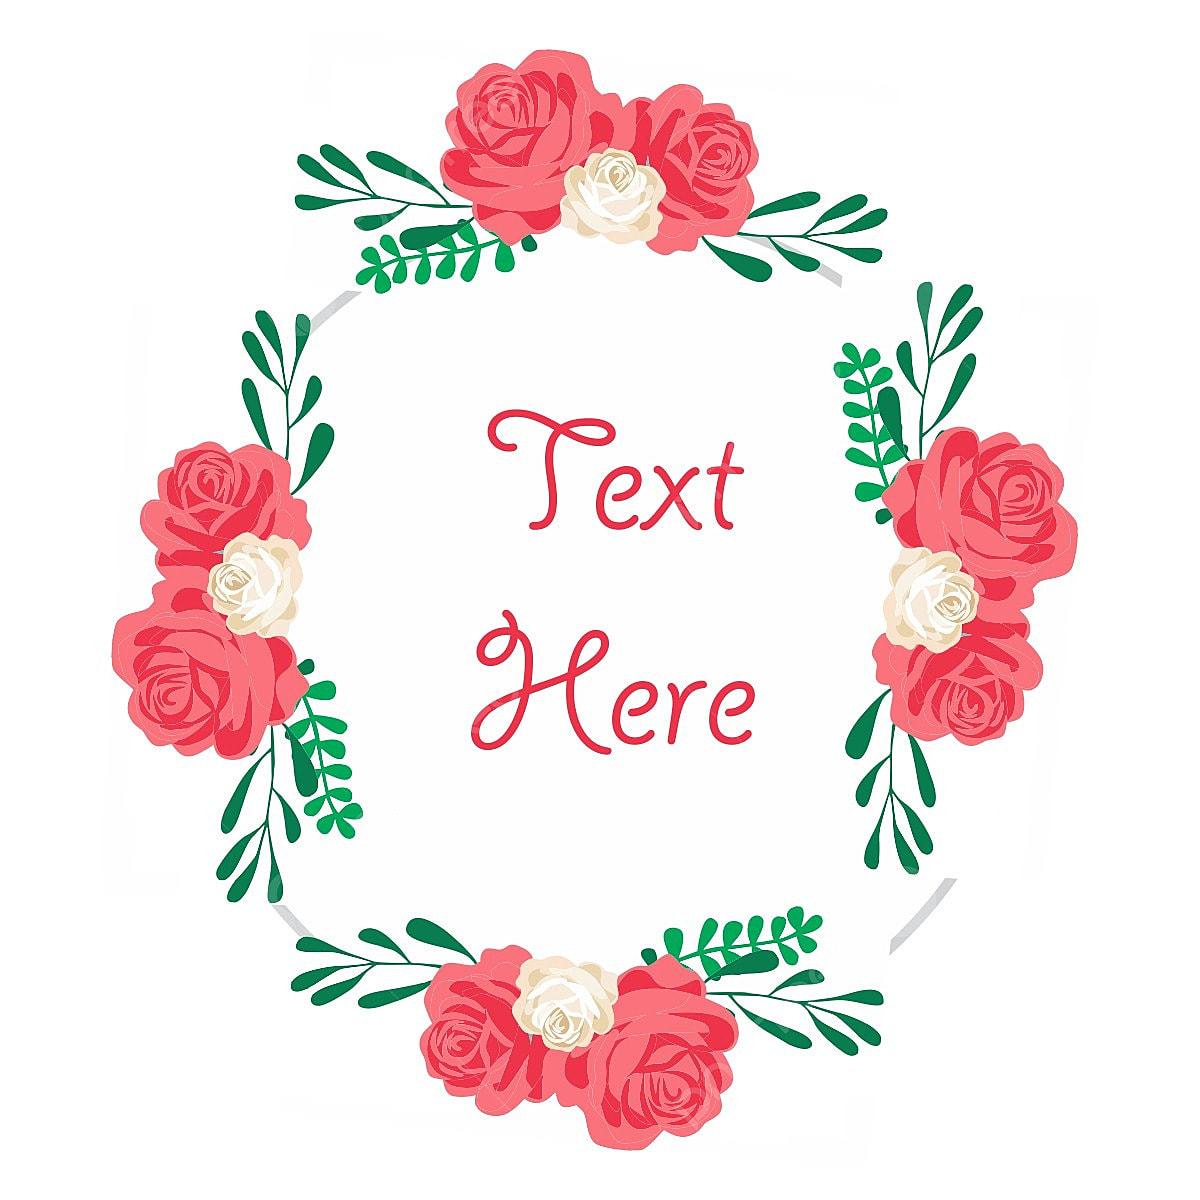 encadr u00e9 vectoriel design floral bo u00eete de texte texte